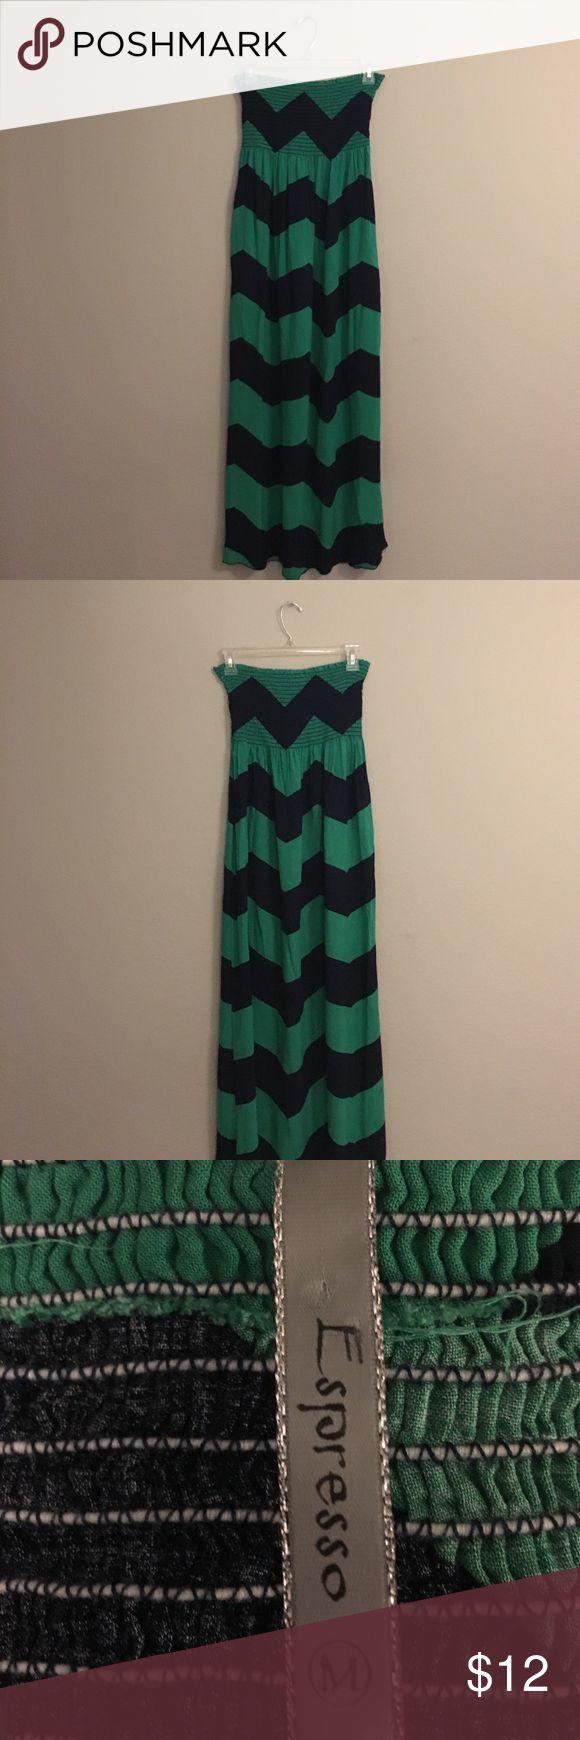 👗 Maxi chevron dress Green and navy blue chevron dress Espresso Dresses Maxi